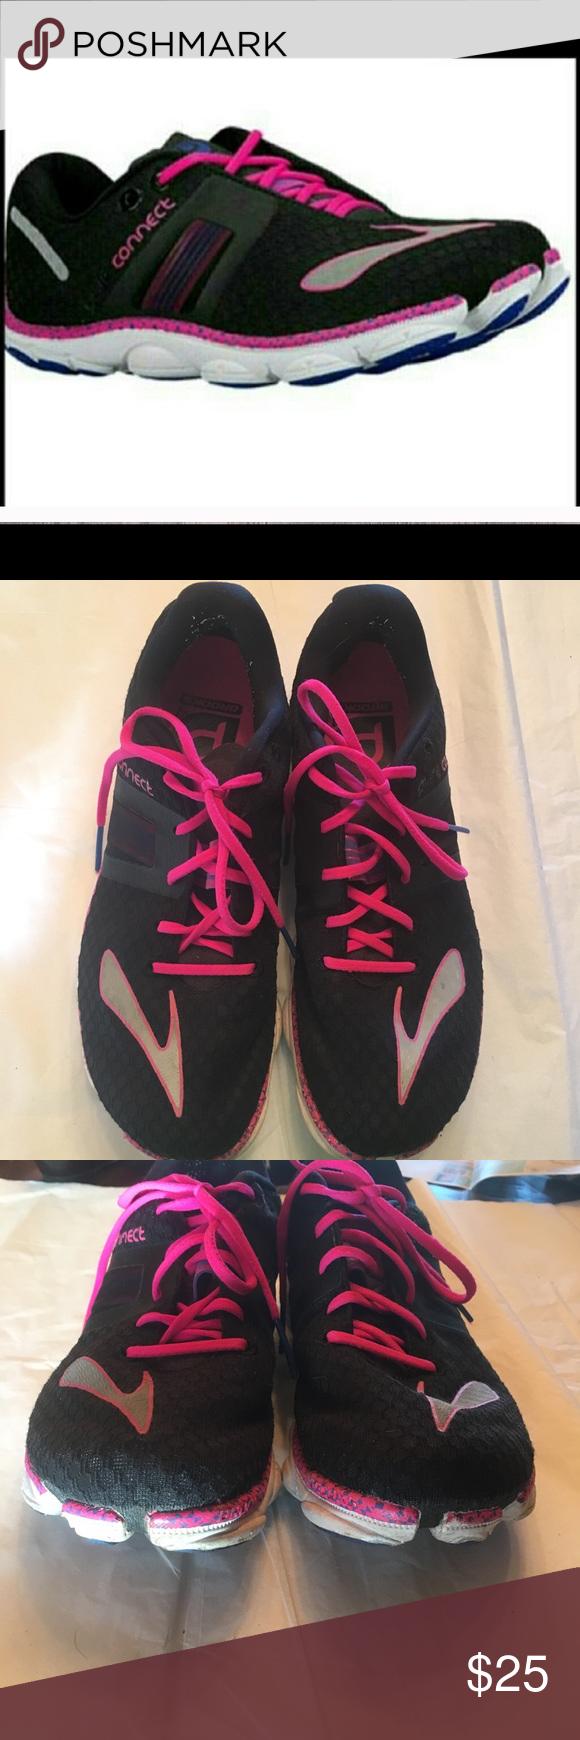 Brooks PureConnect 4 Women's 9.5 Shoes